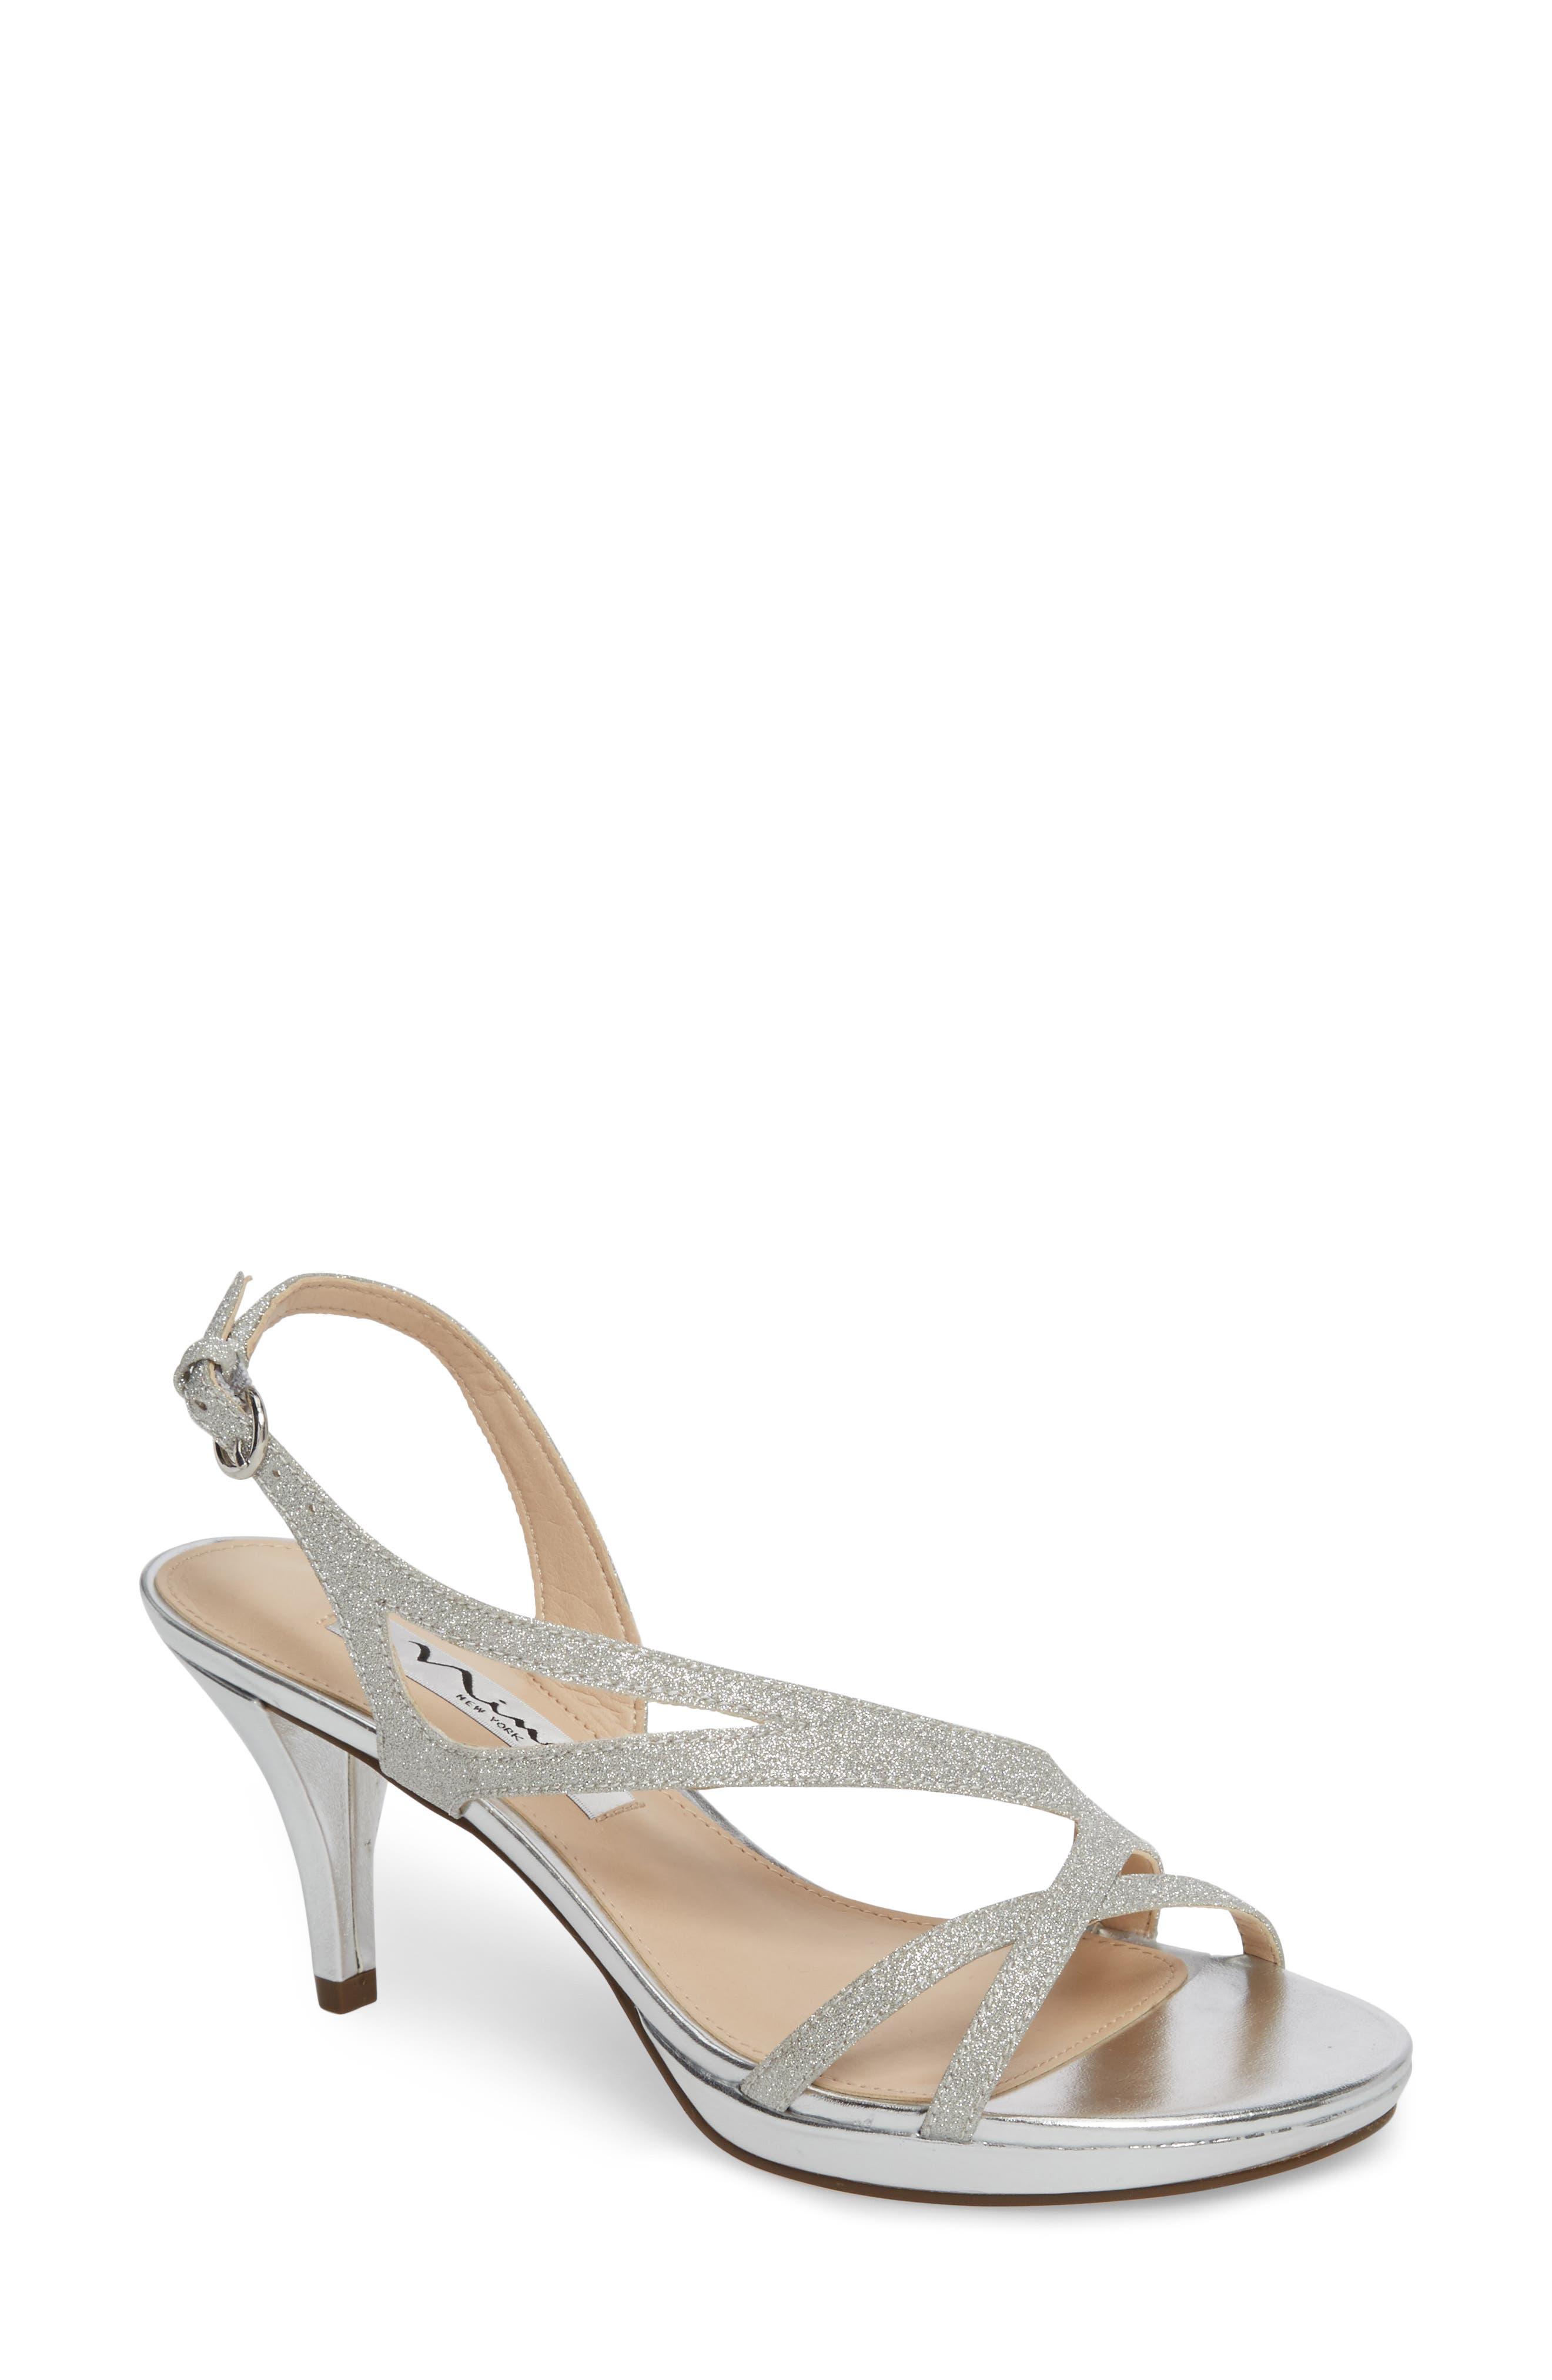 Nura Sandal,                             Main thumbnail 1, color,                             Silver Glitter Fabric